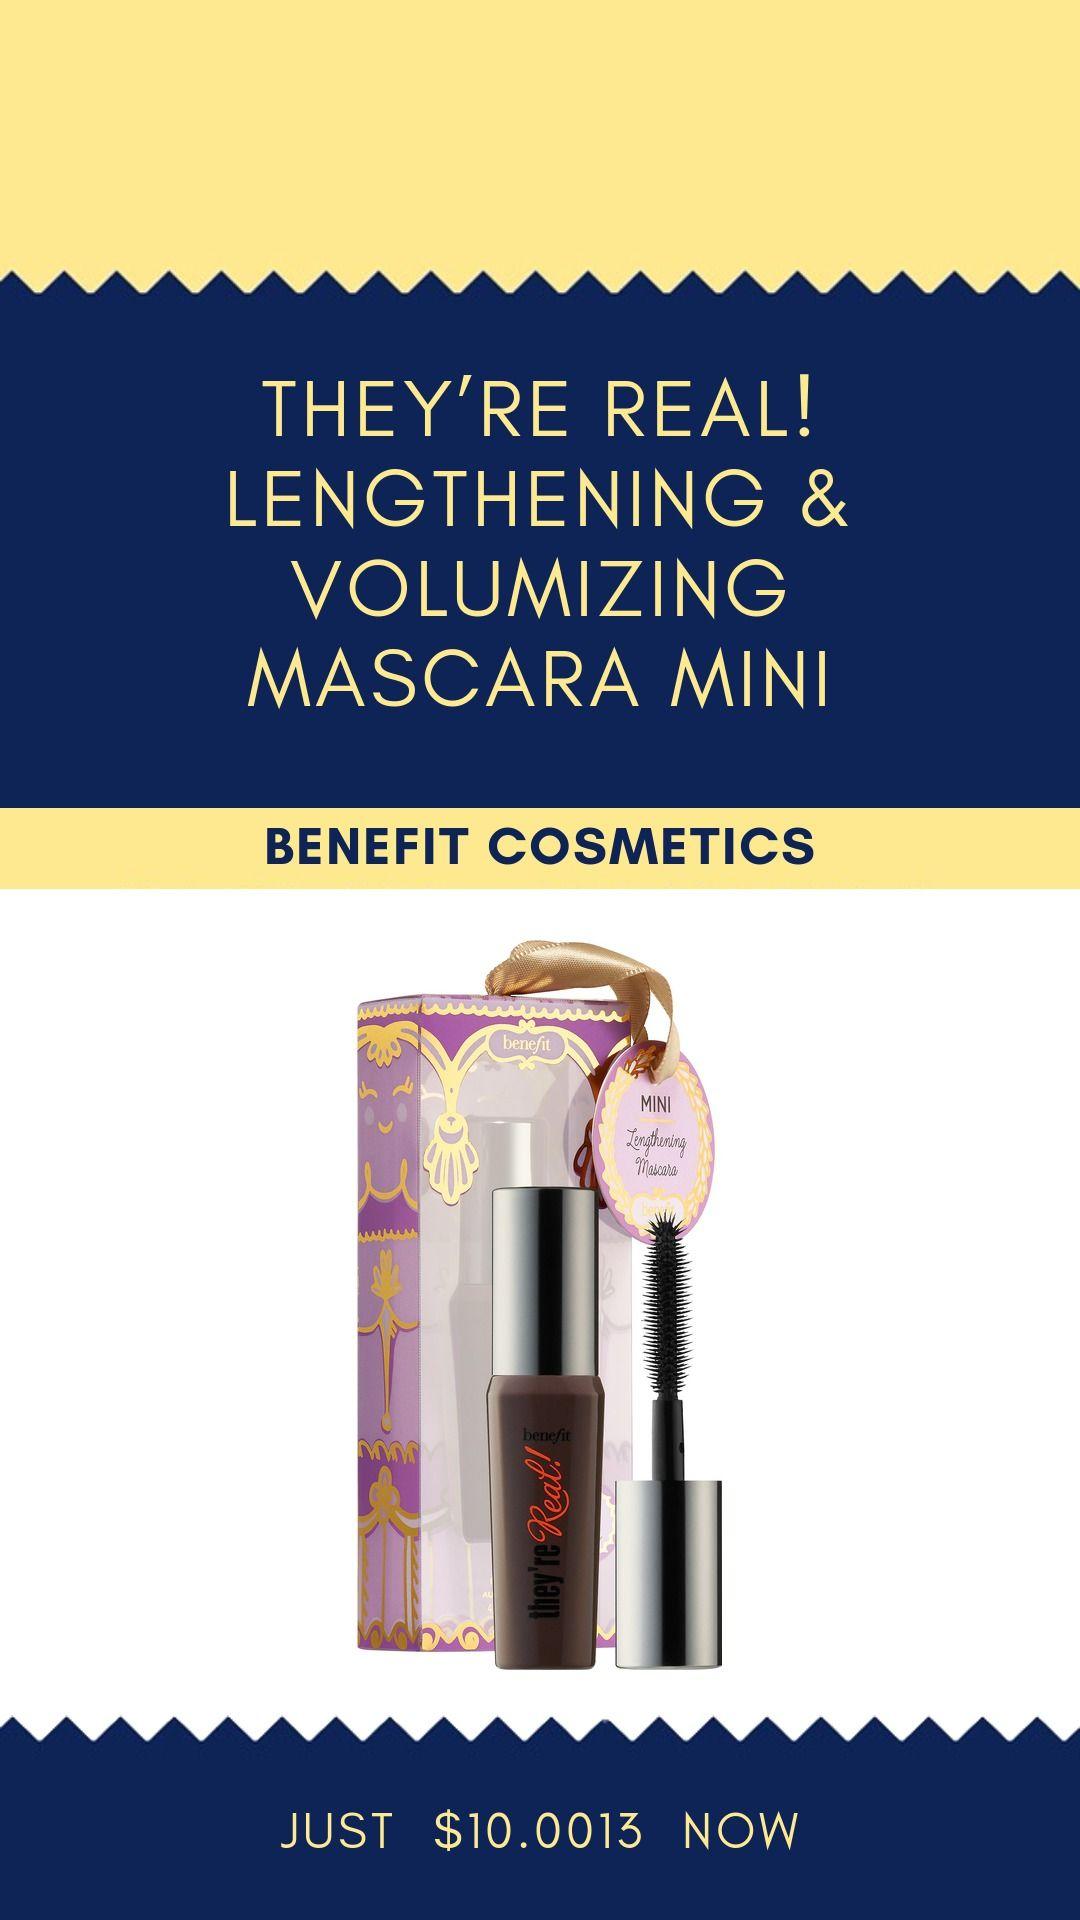 Mini theyre real lengthening mascara benefit cosmetics